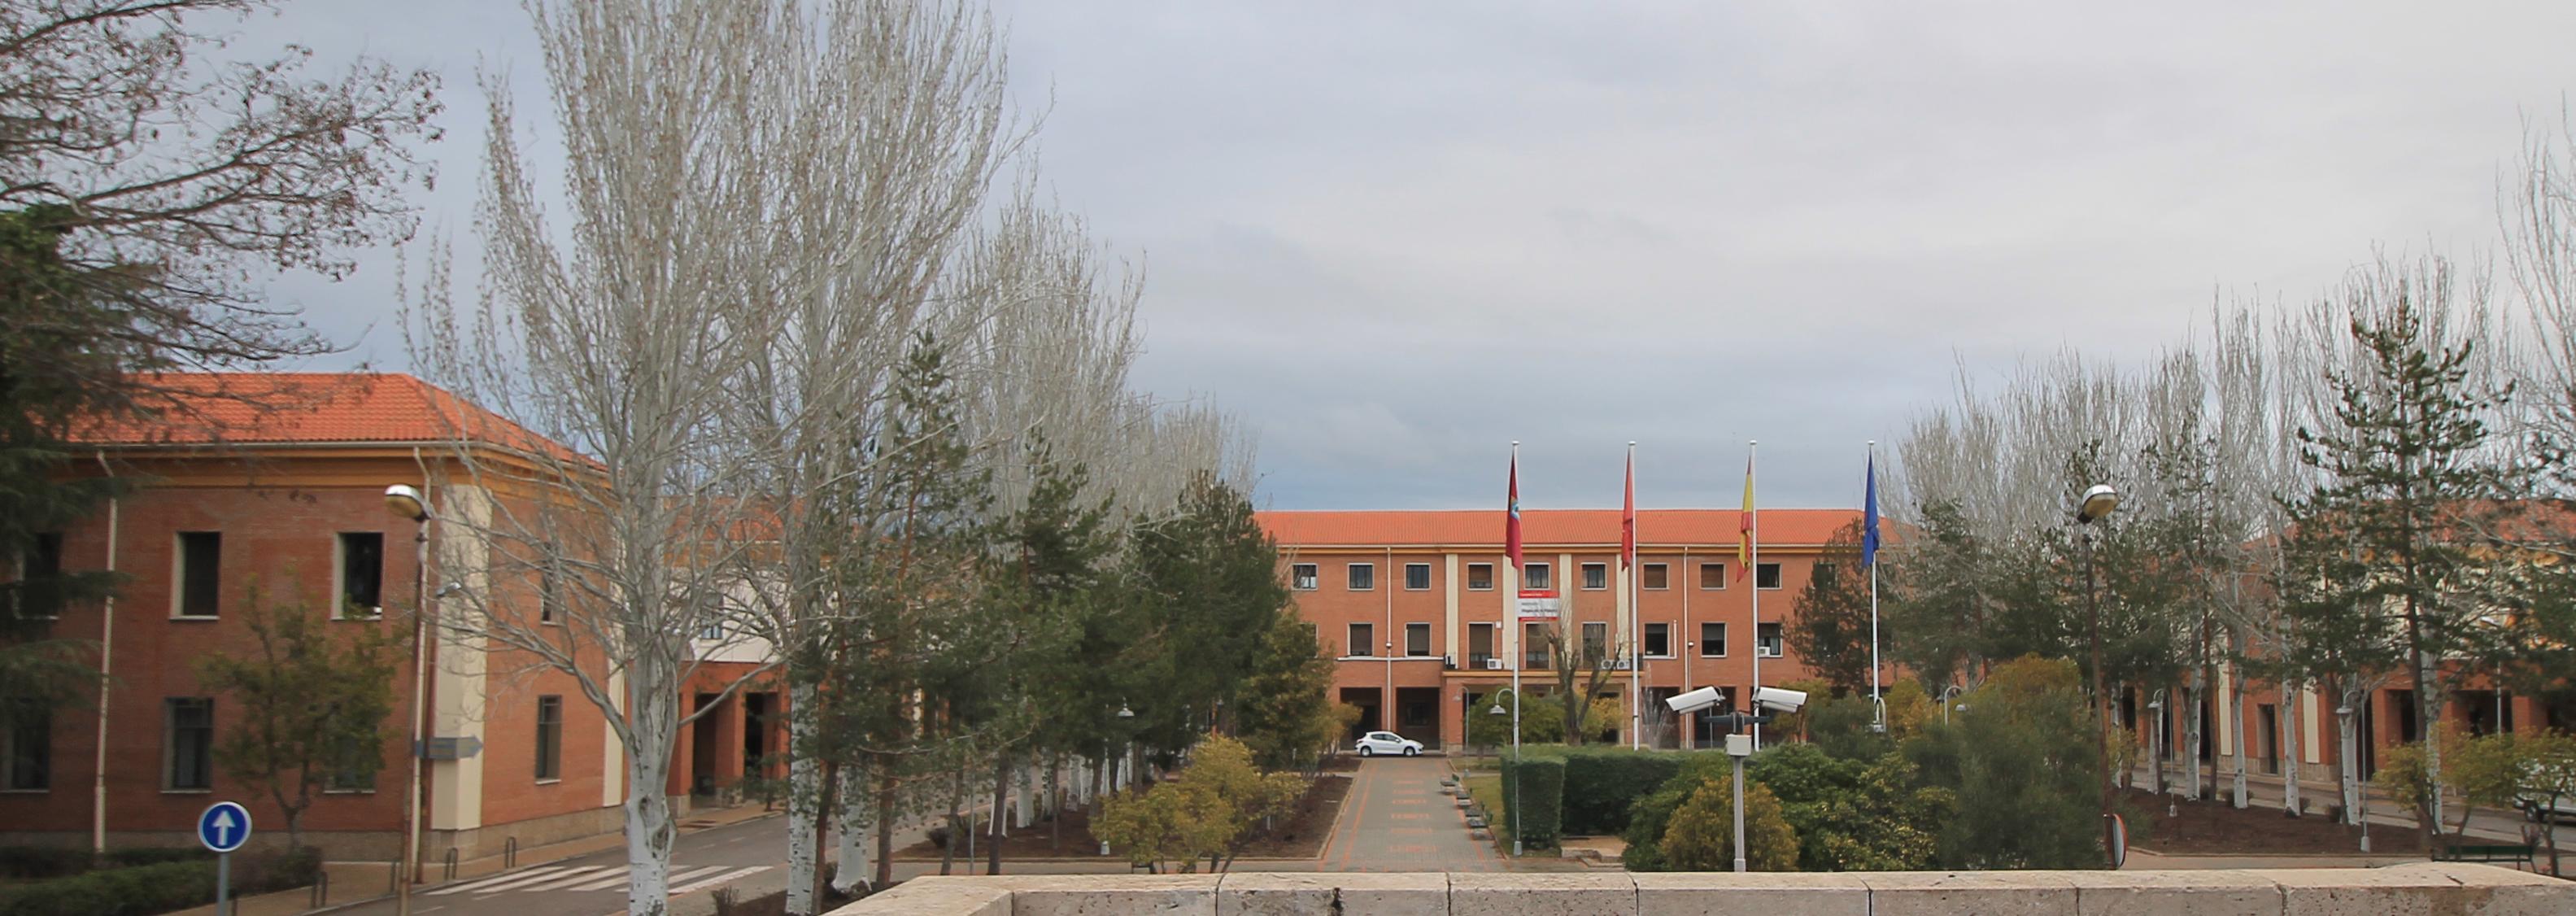 Instituto Virgen De La Paloma Wikipedia La Enciclopedia Libre